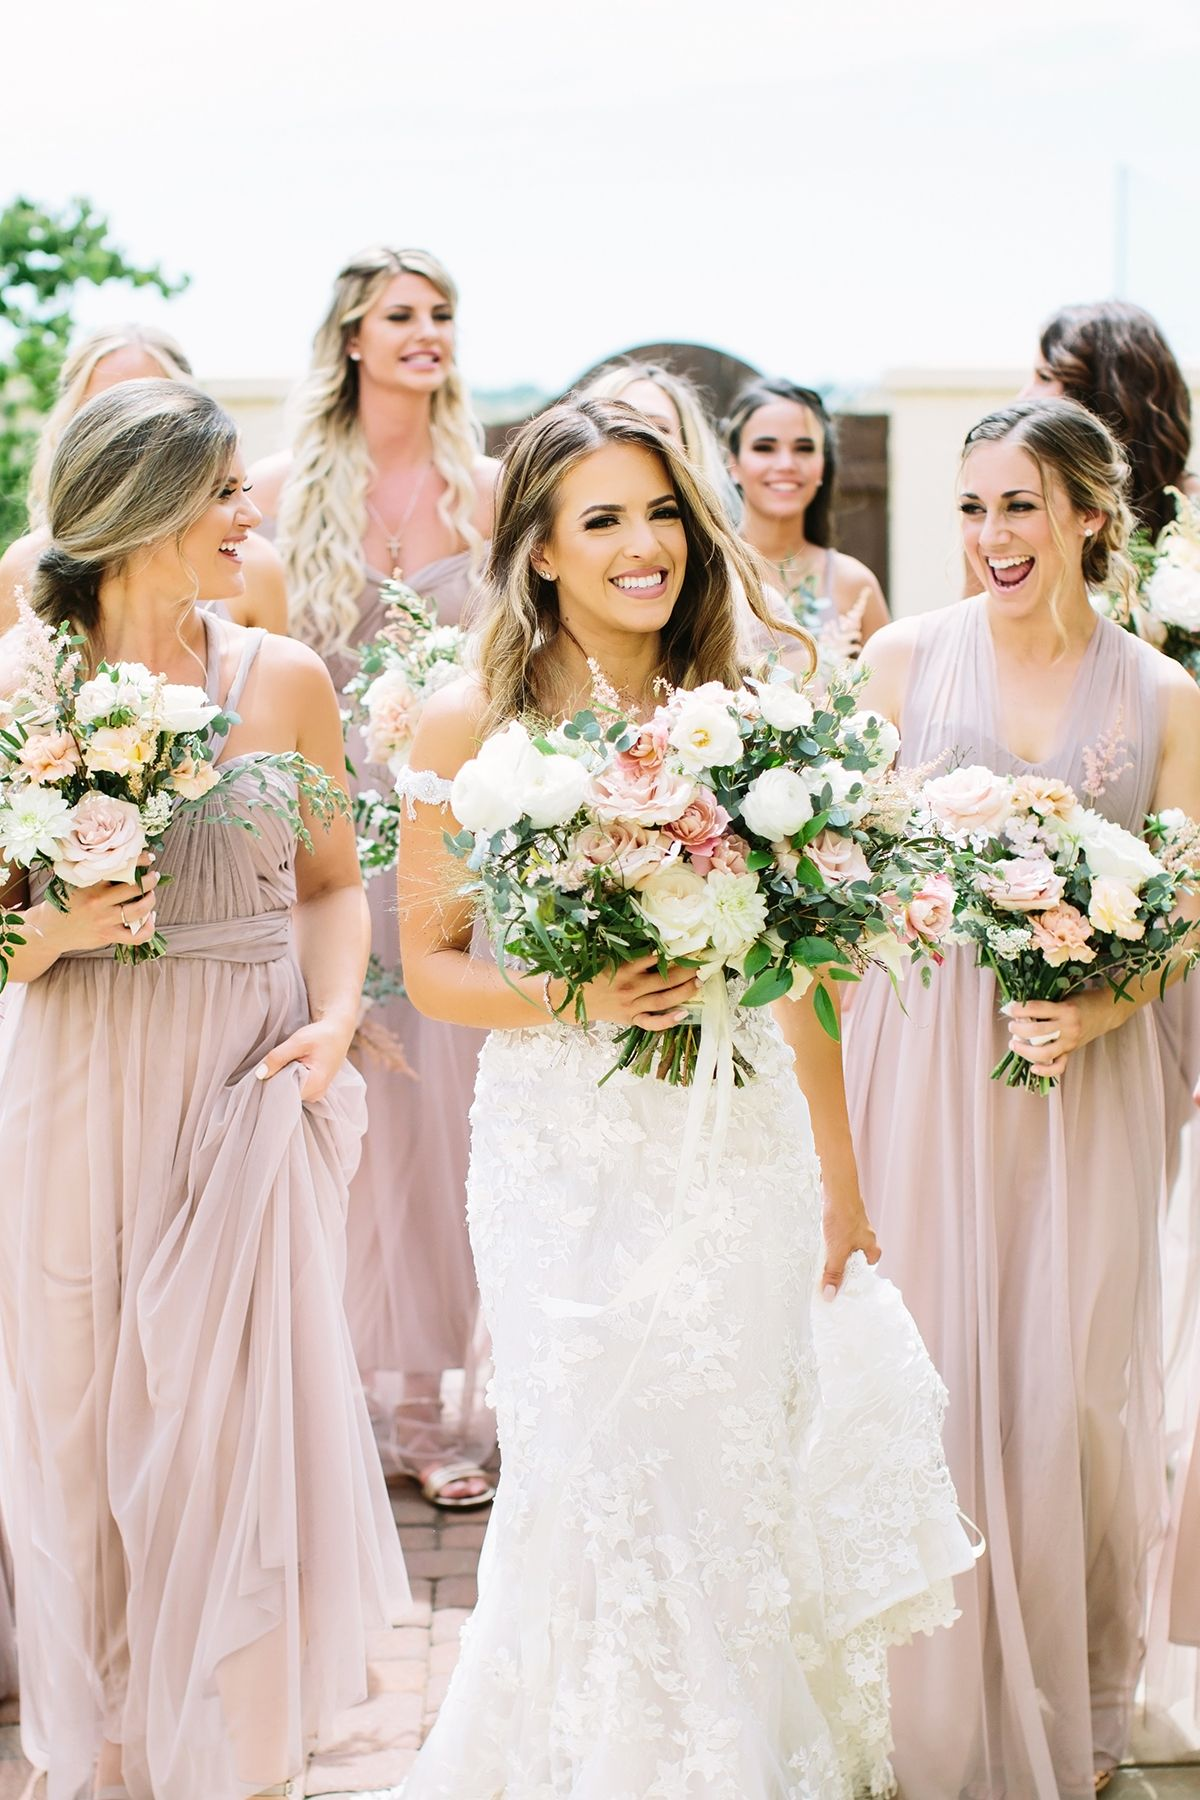 Shop Birdy Grey's convertible bridesmaid dresses under $100 #bridesmaiddresses #bridesmaid #weddingdress #weddingflowers #under$100 #fashion #budgetwedding